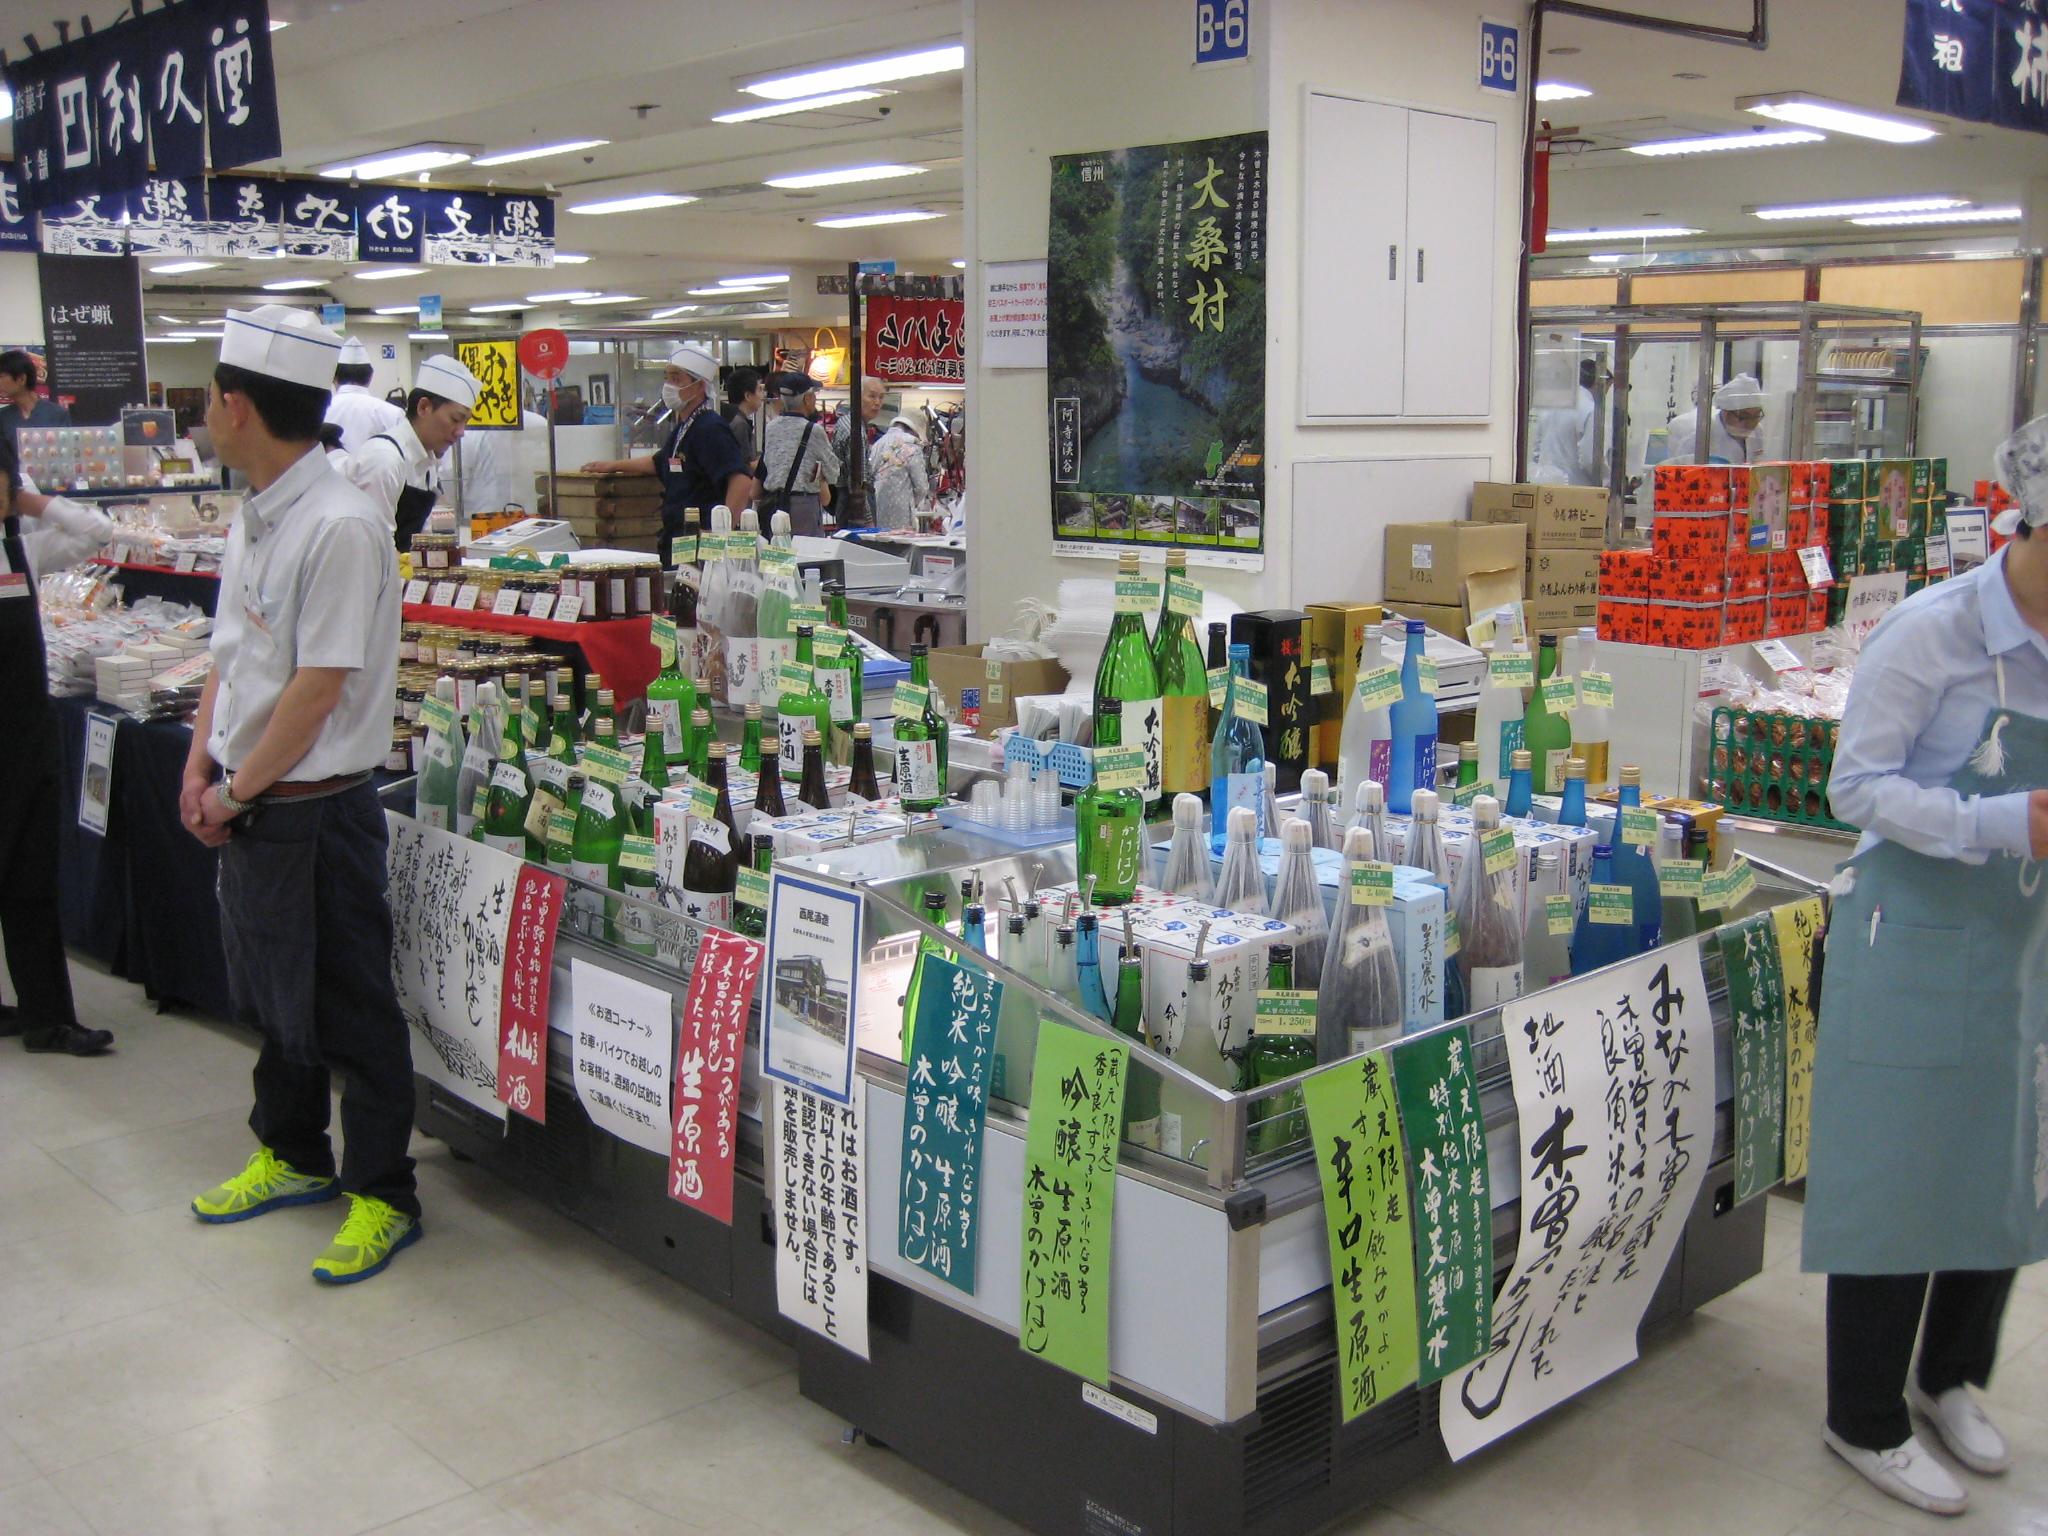 h28信州・越後の物産展:京王百貨店新宿店